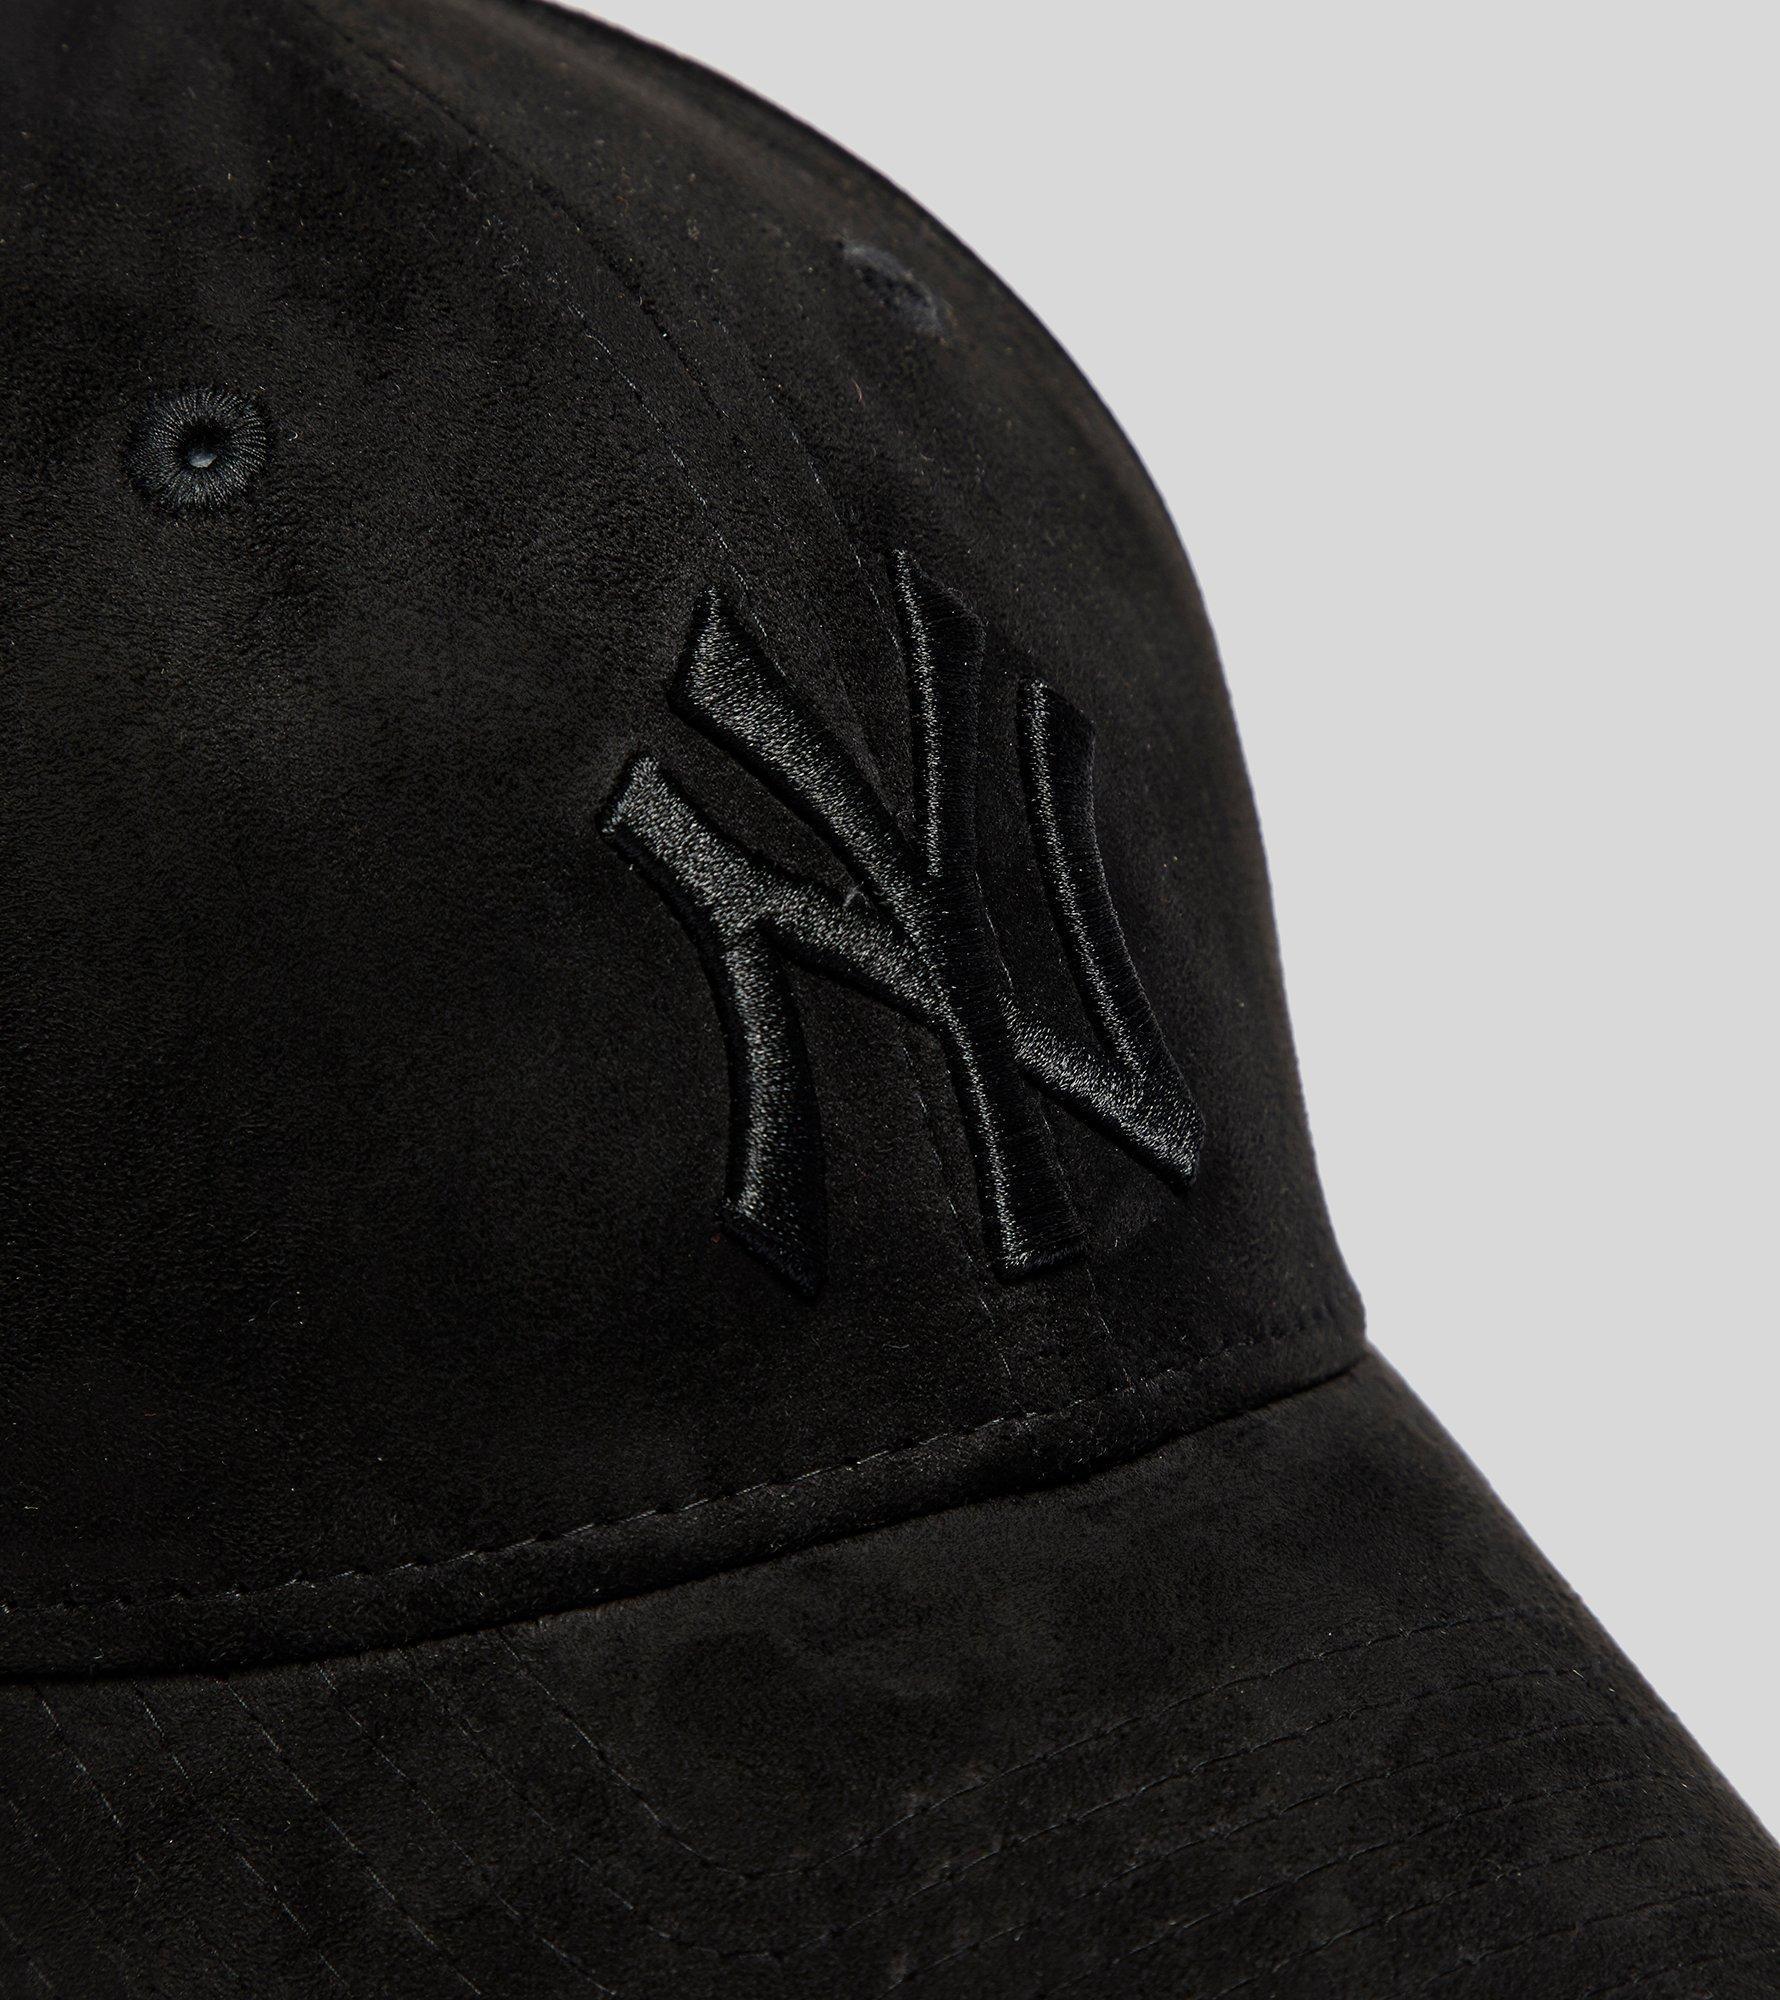 cd98ef36 ... uk lyst ktz 9forty new york yankees suede cap in black for men f4504  438d6